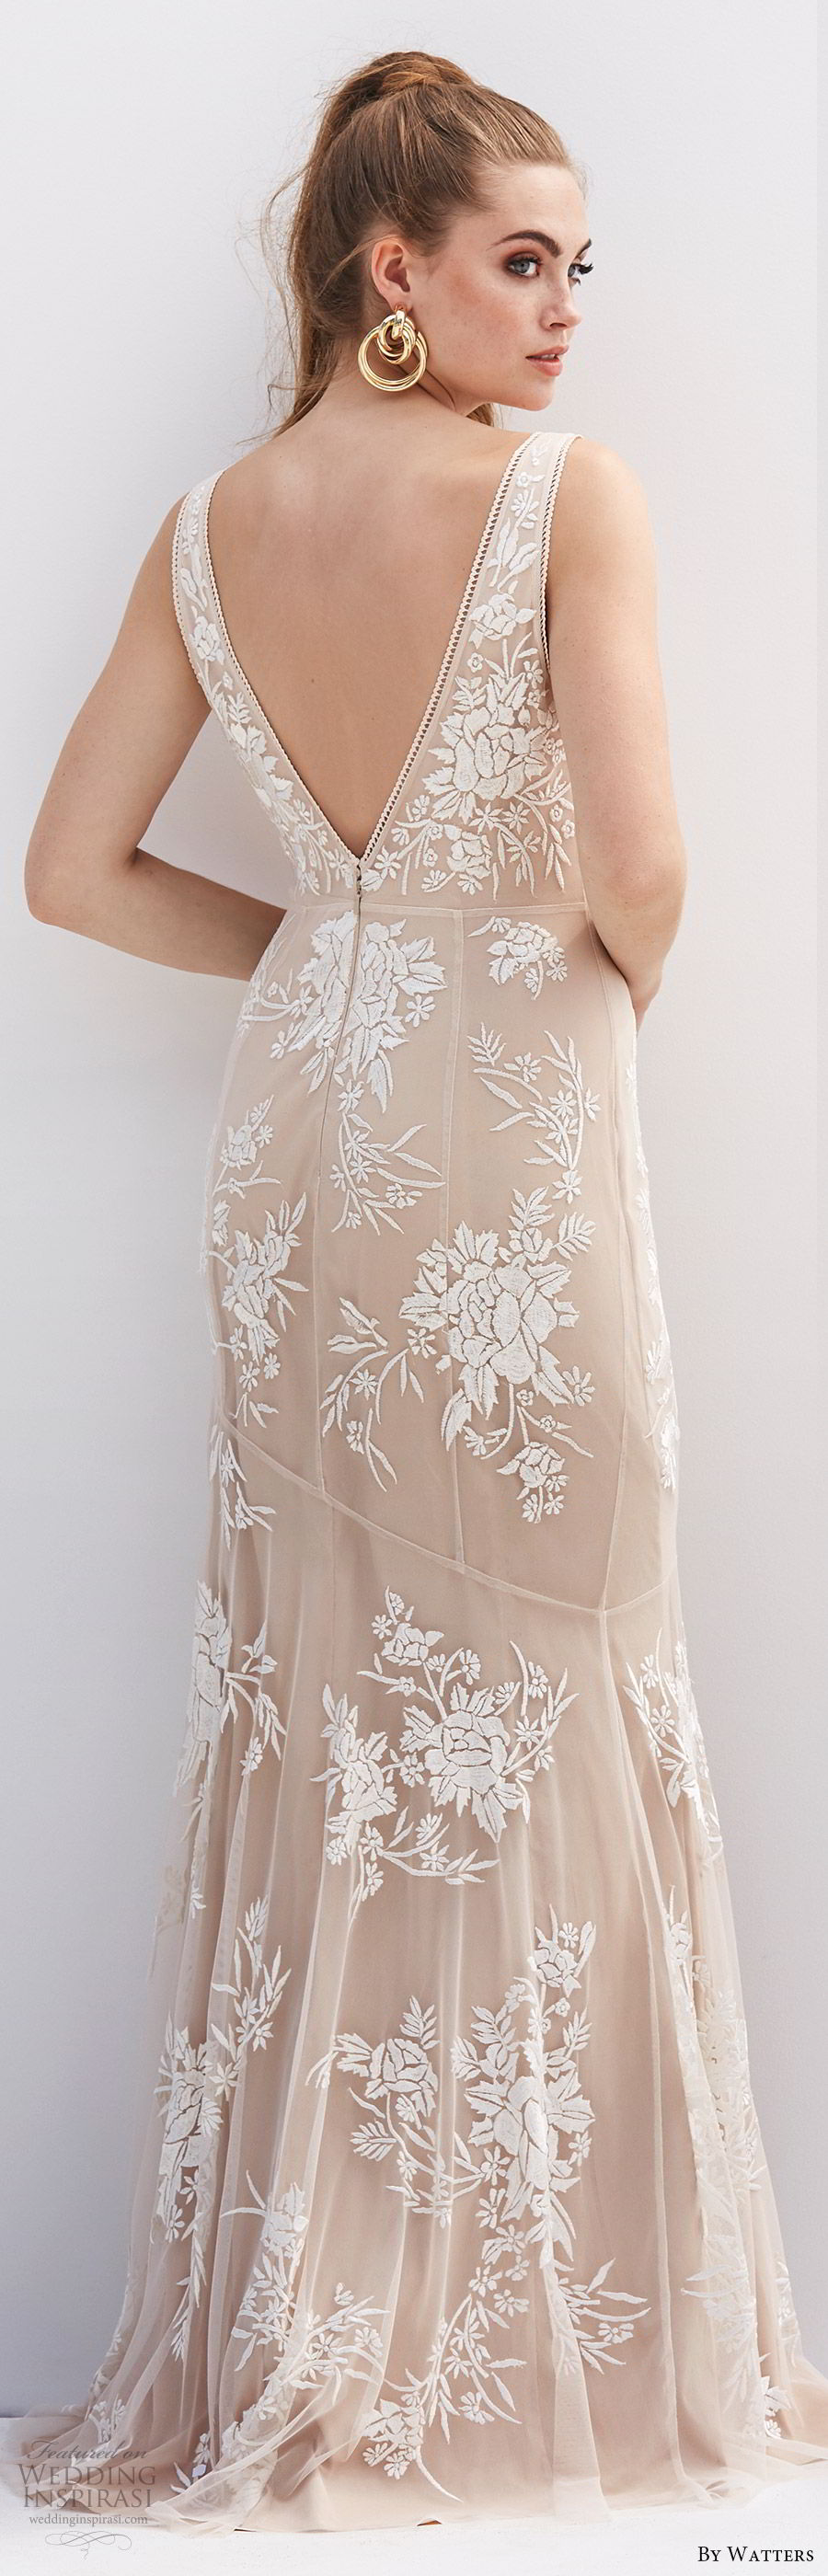 by watters 2020 bridal sleeveless deep v neck lace sheath wedding dress (5) v back sweep train champagne blush color elegant bv